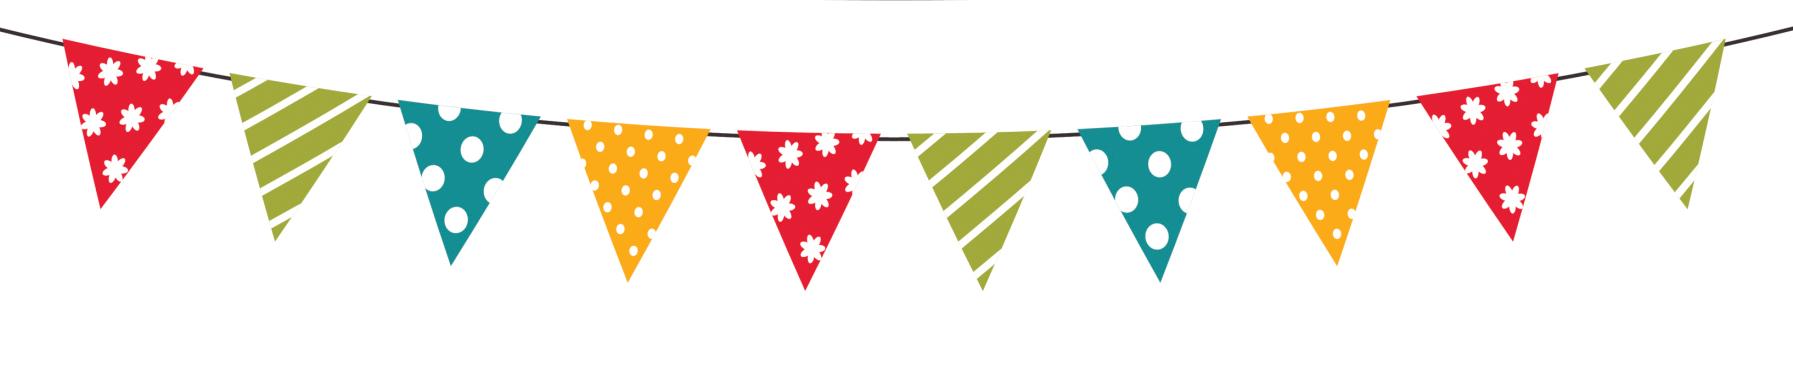 Celebrate Clipart Banner Celebrate Banner Transparent Free For Download On Webstockreview 2020